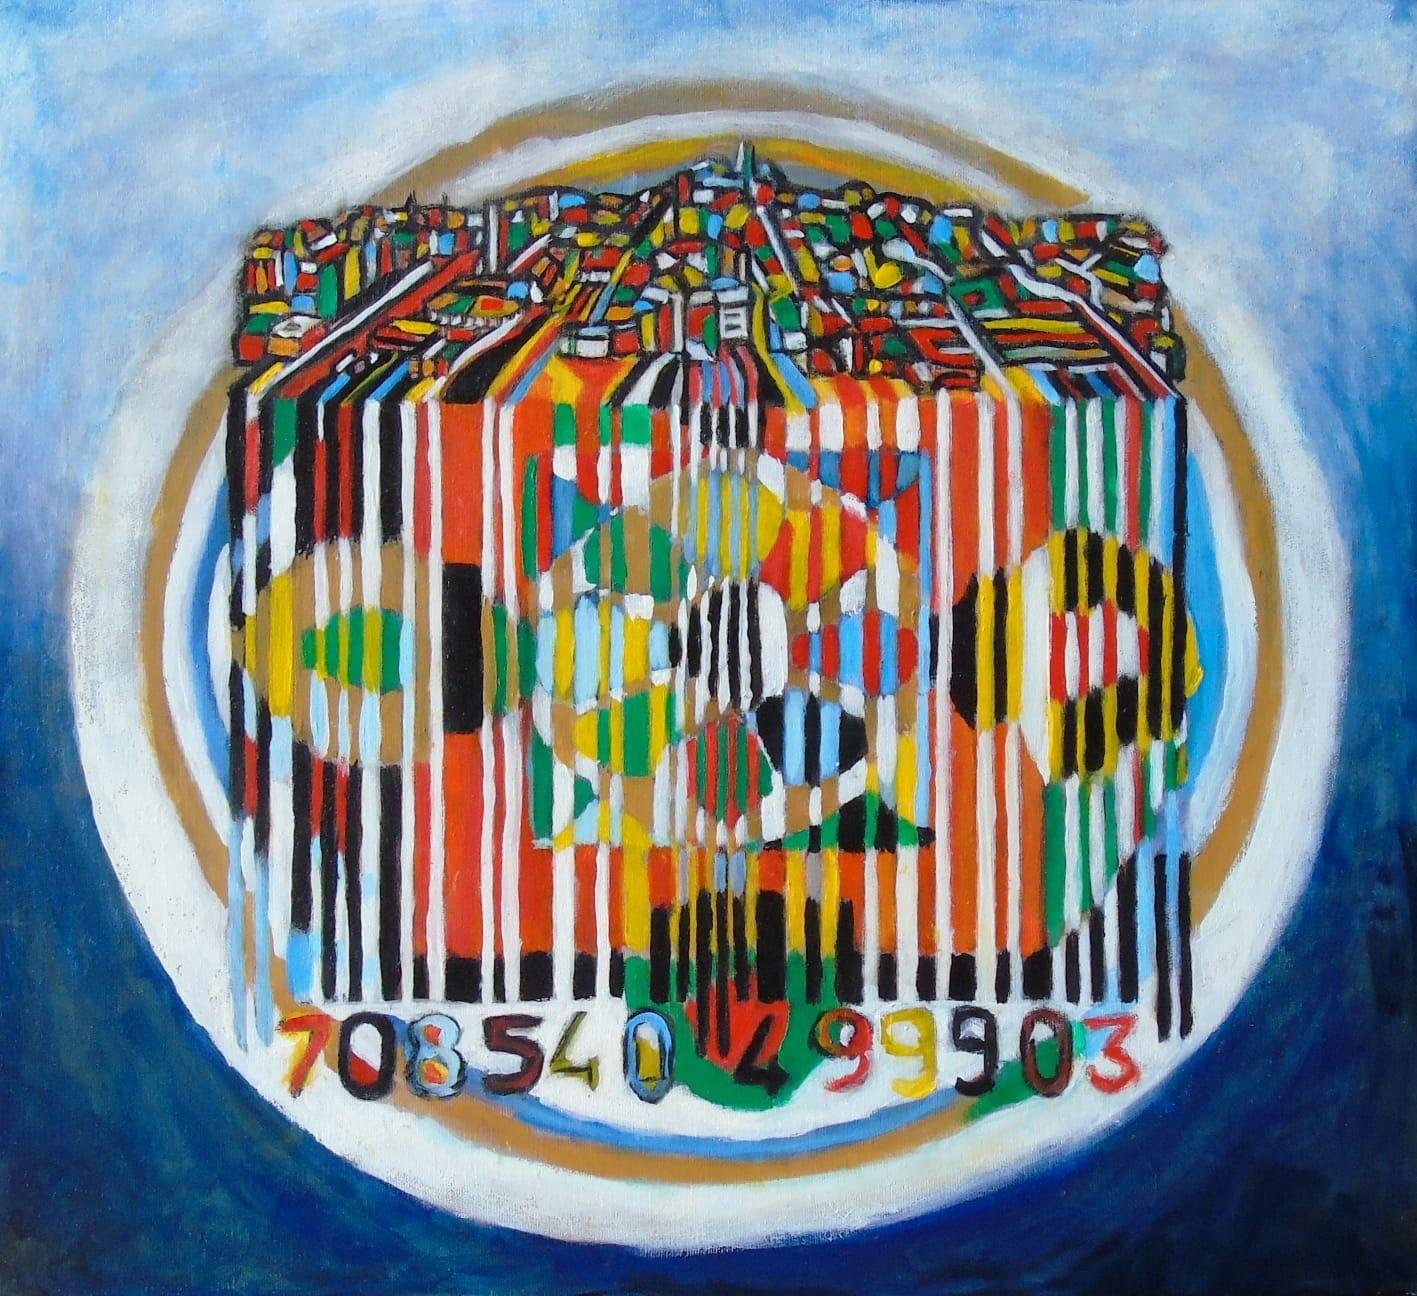 OLIO SU TELA SEBASTIAN DE GOBBIS ' CODECITY@MANDALA 3 '  dimensioni L 59 x H 54 cm.